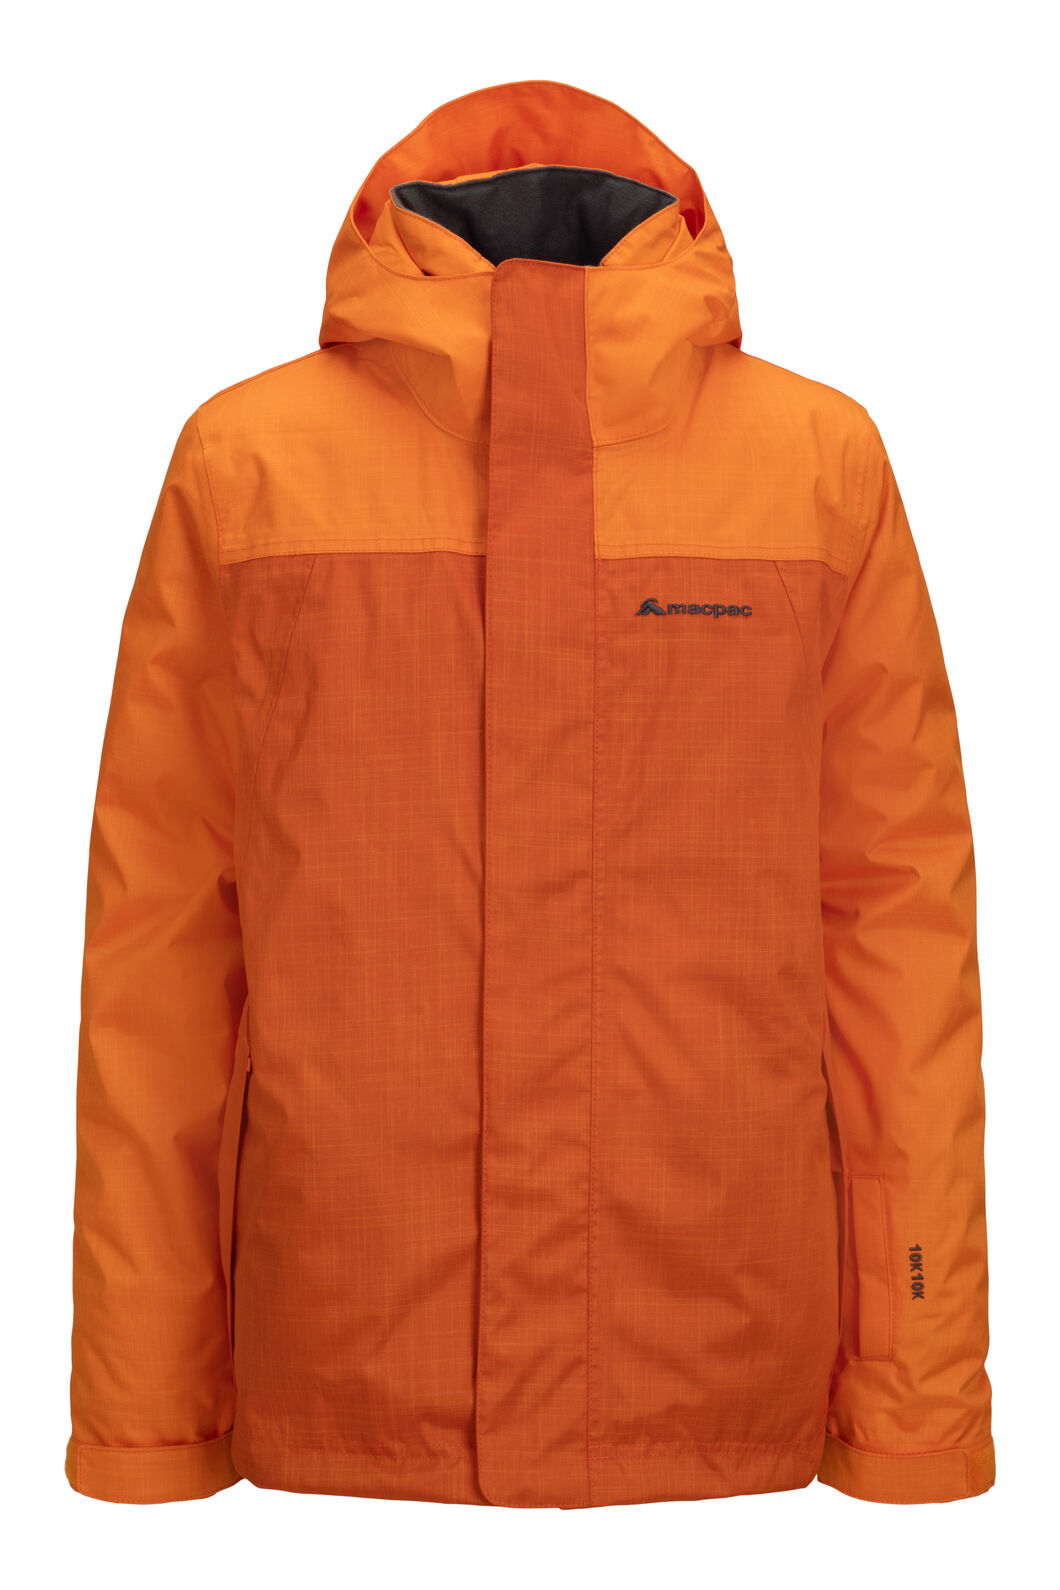 Macpac Kids' Spree Reflex™ Ski Jacket, Russet Orange/Orange Flame, hi-res